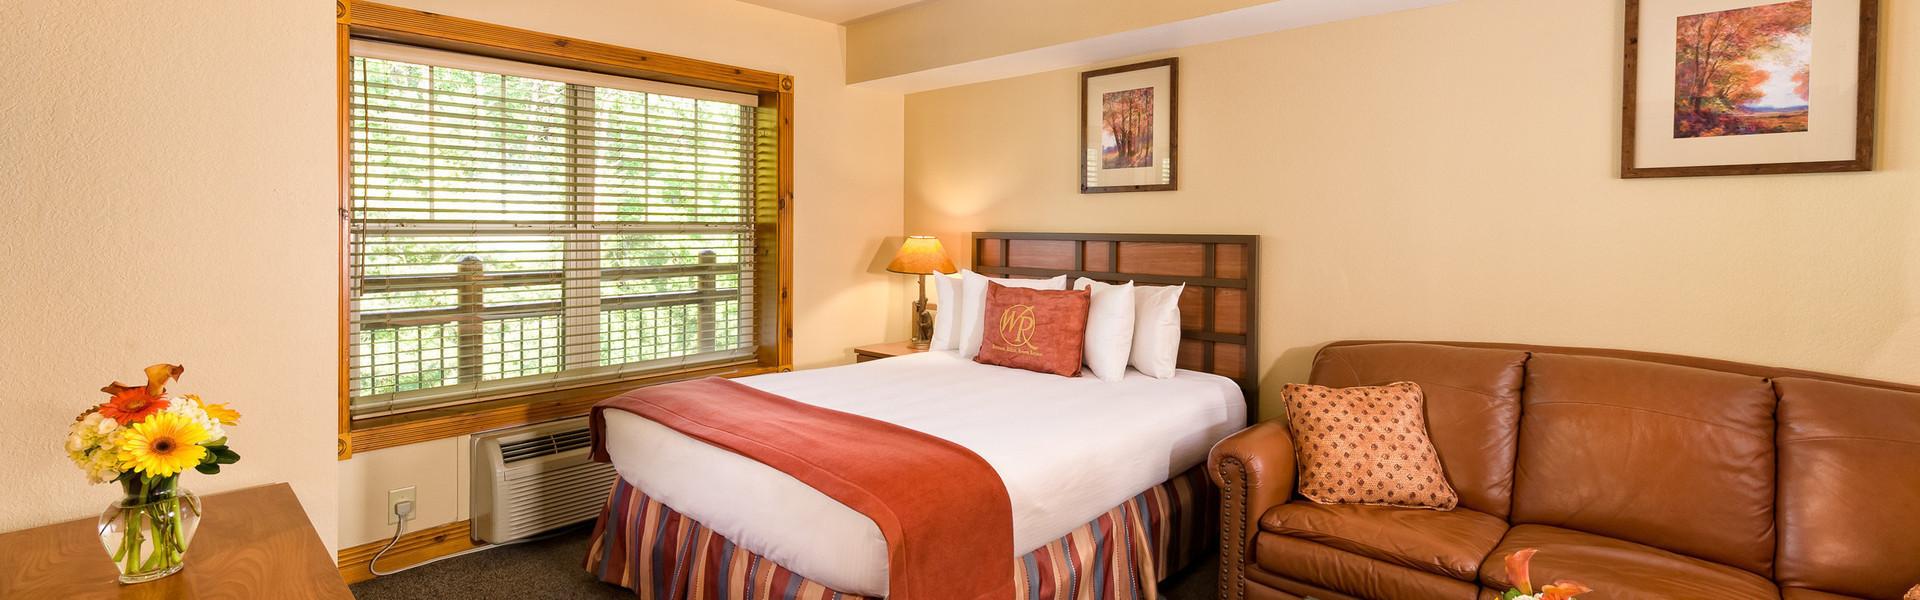 Studio Villas at Our Gatlinburg Resort near the Smoky Mountains | Spacious Living